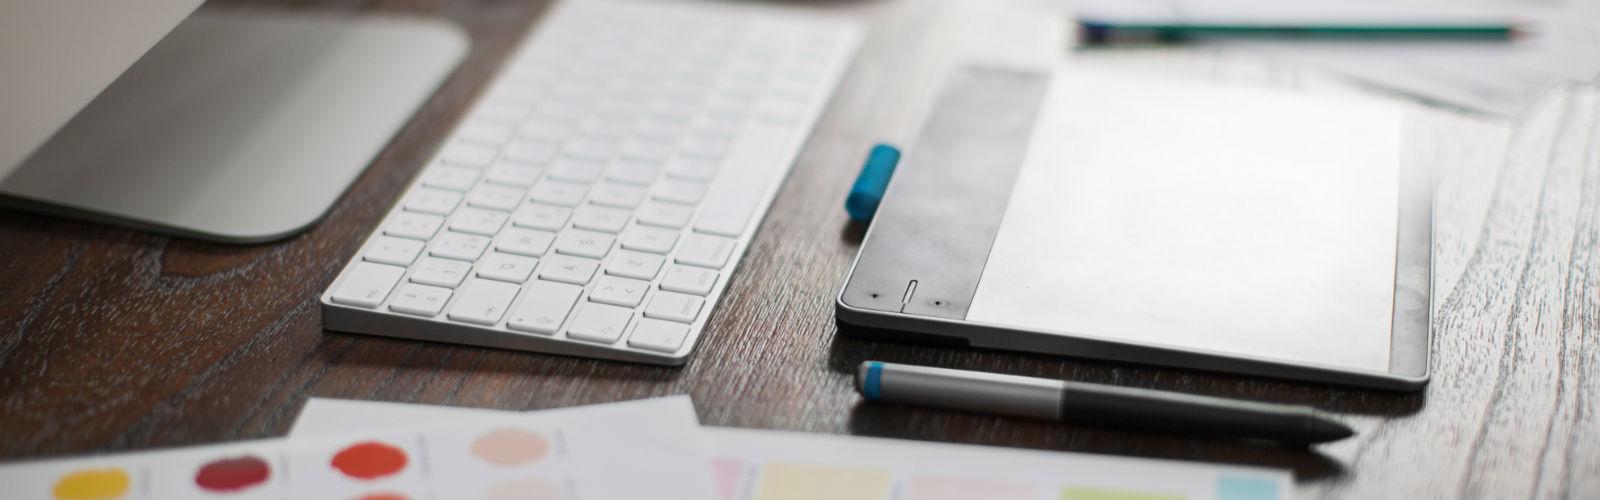 Image: Graphic Designer's desk